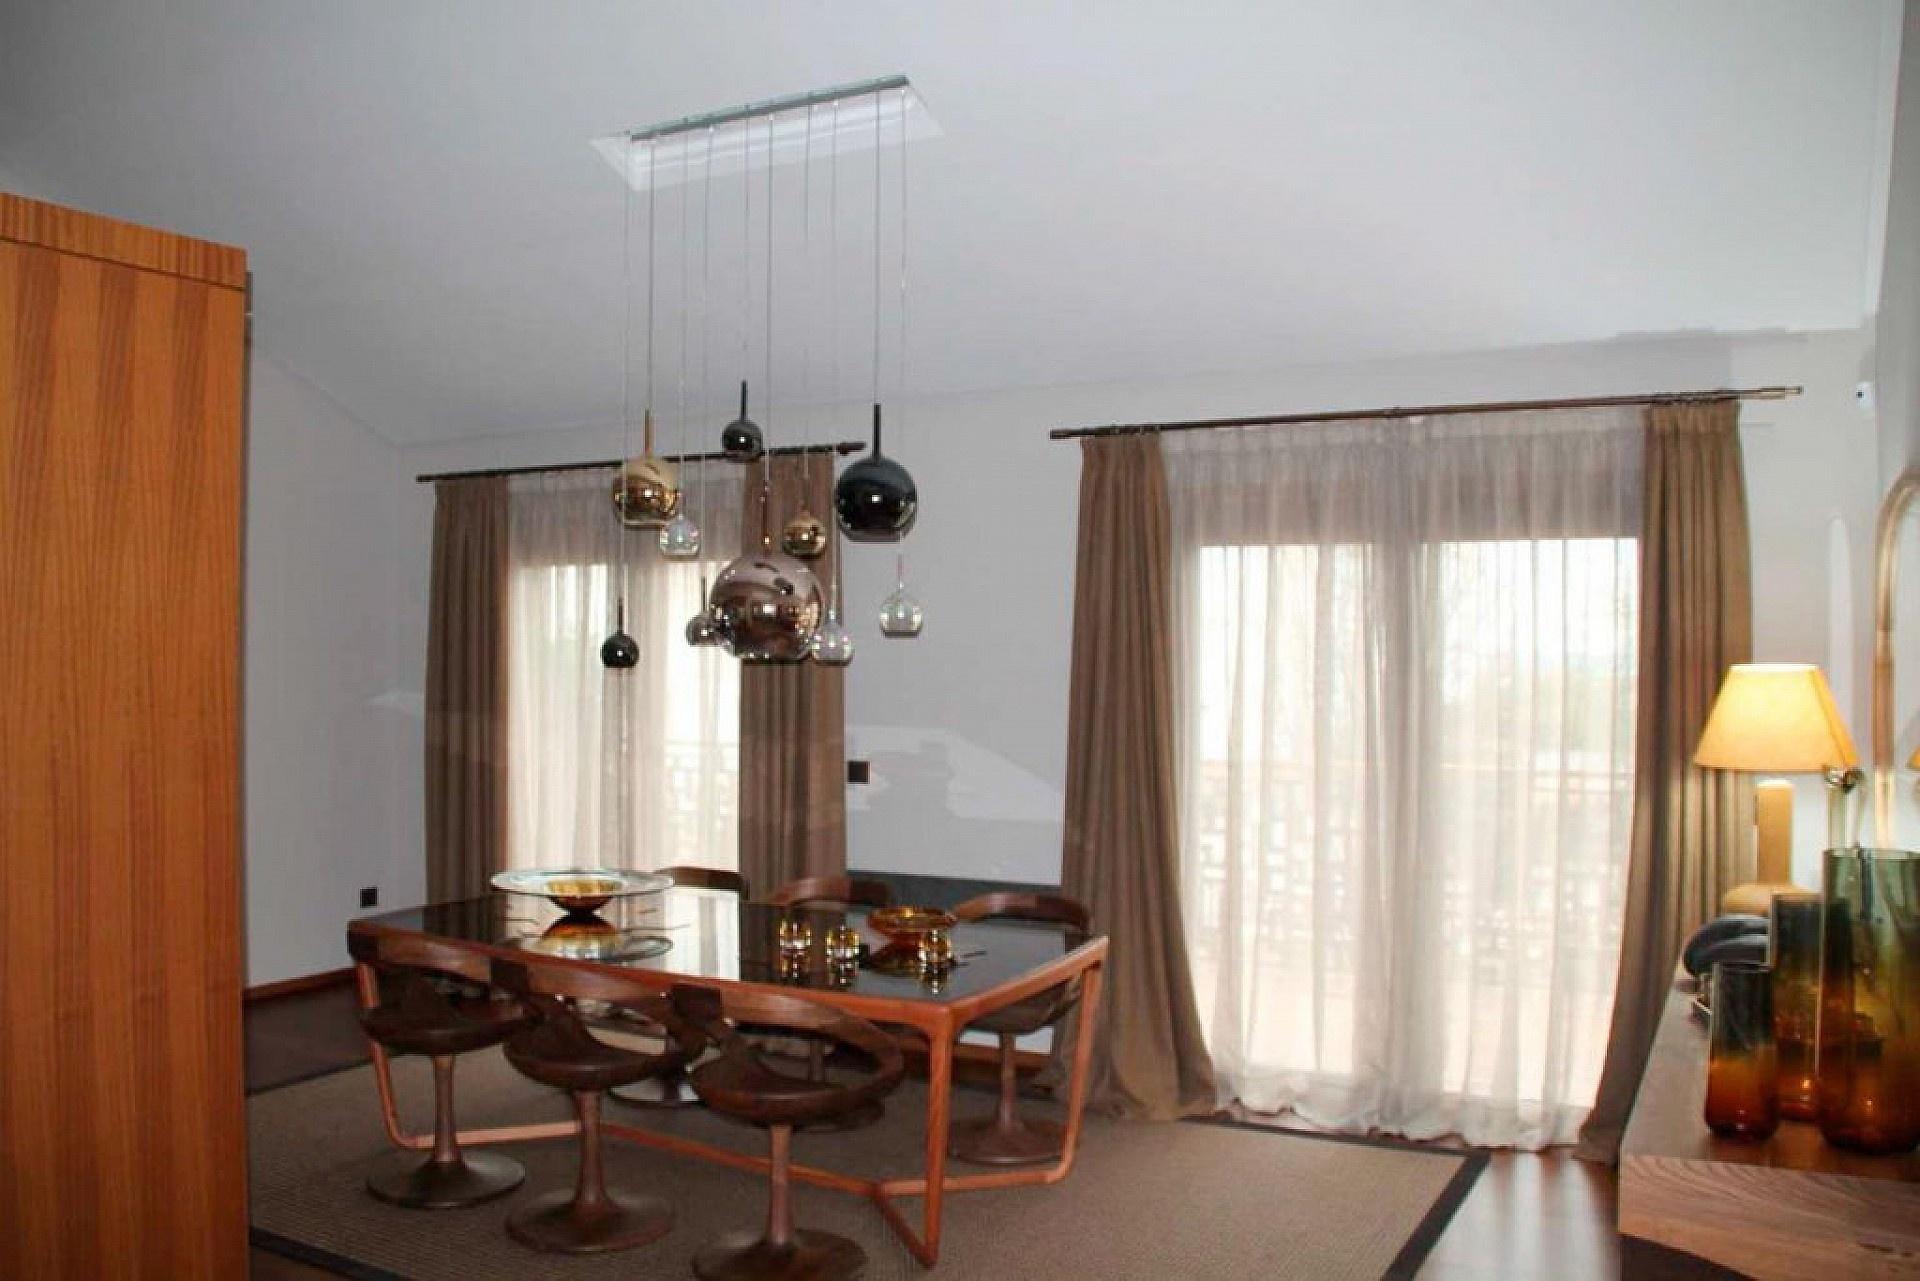 w_denia-huis-tekoop-costa-blanca-spanje-24.jpg